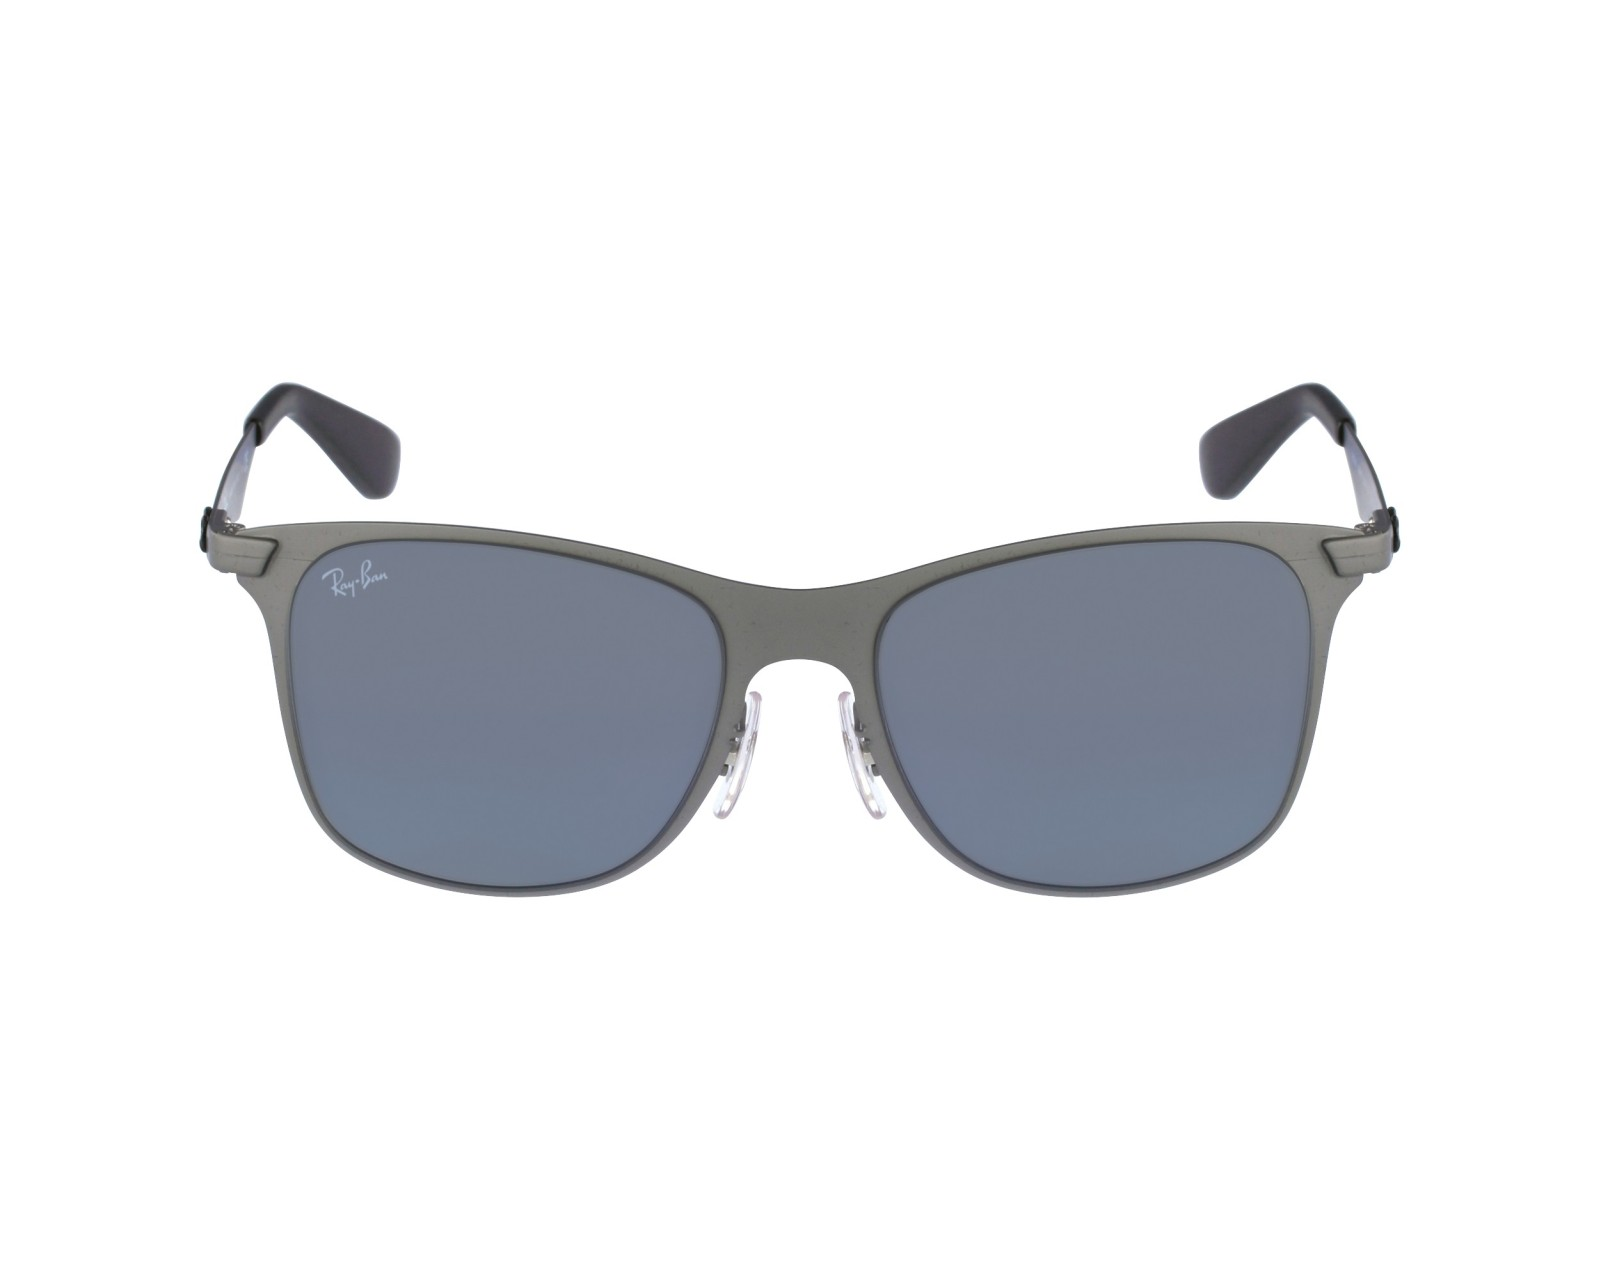 91c0eba7c56 thumbnail Sunglasses Ray-Ban RB-3521 029 88 - Grey profile view